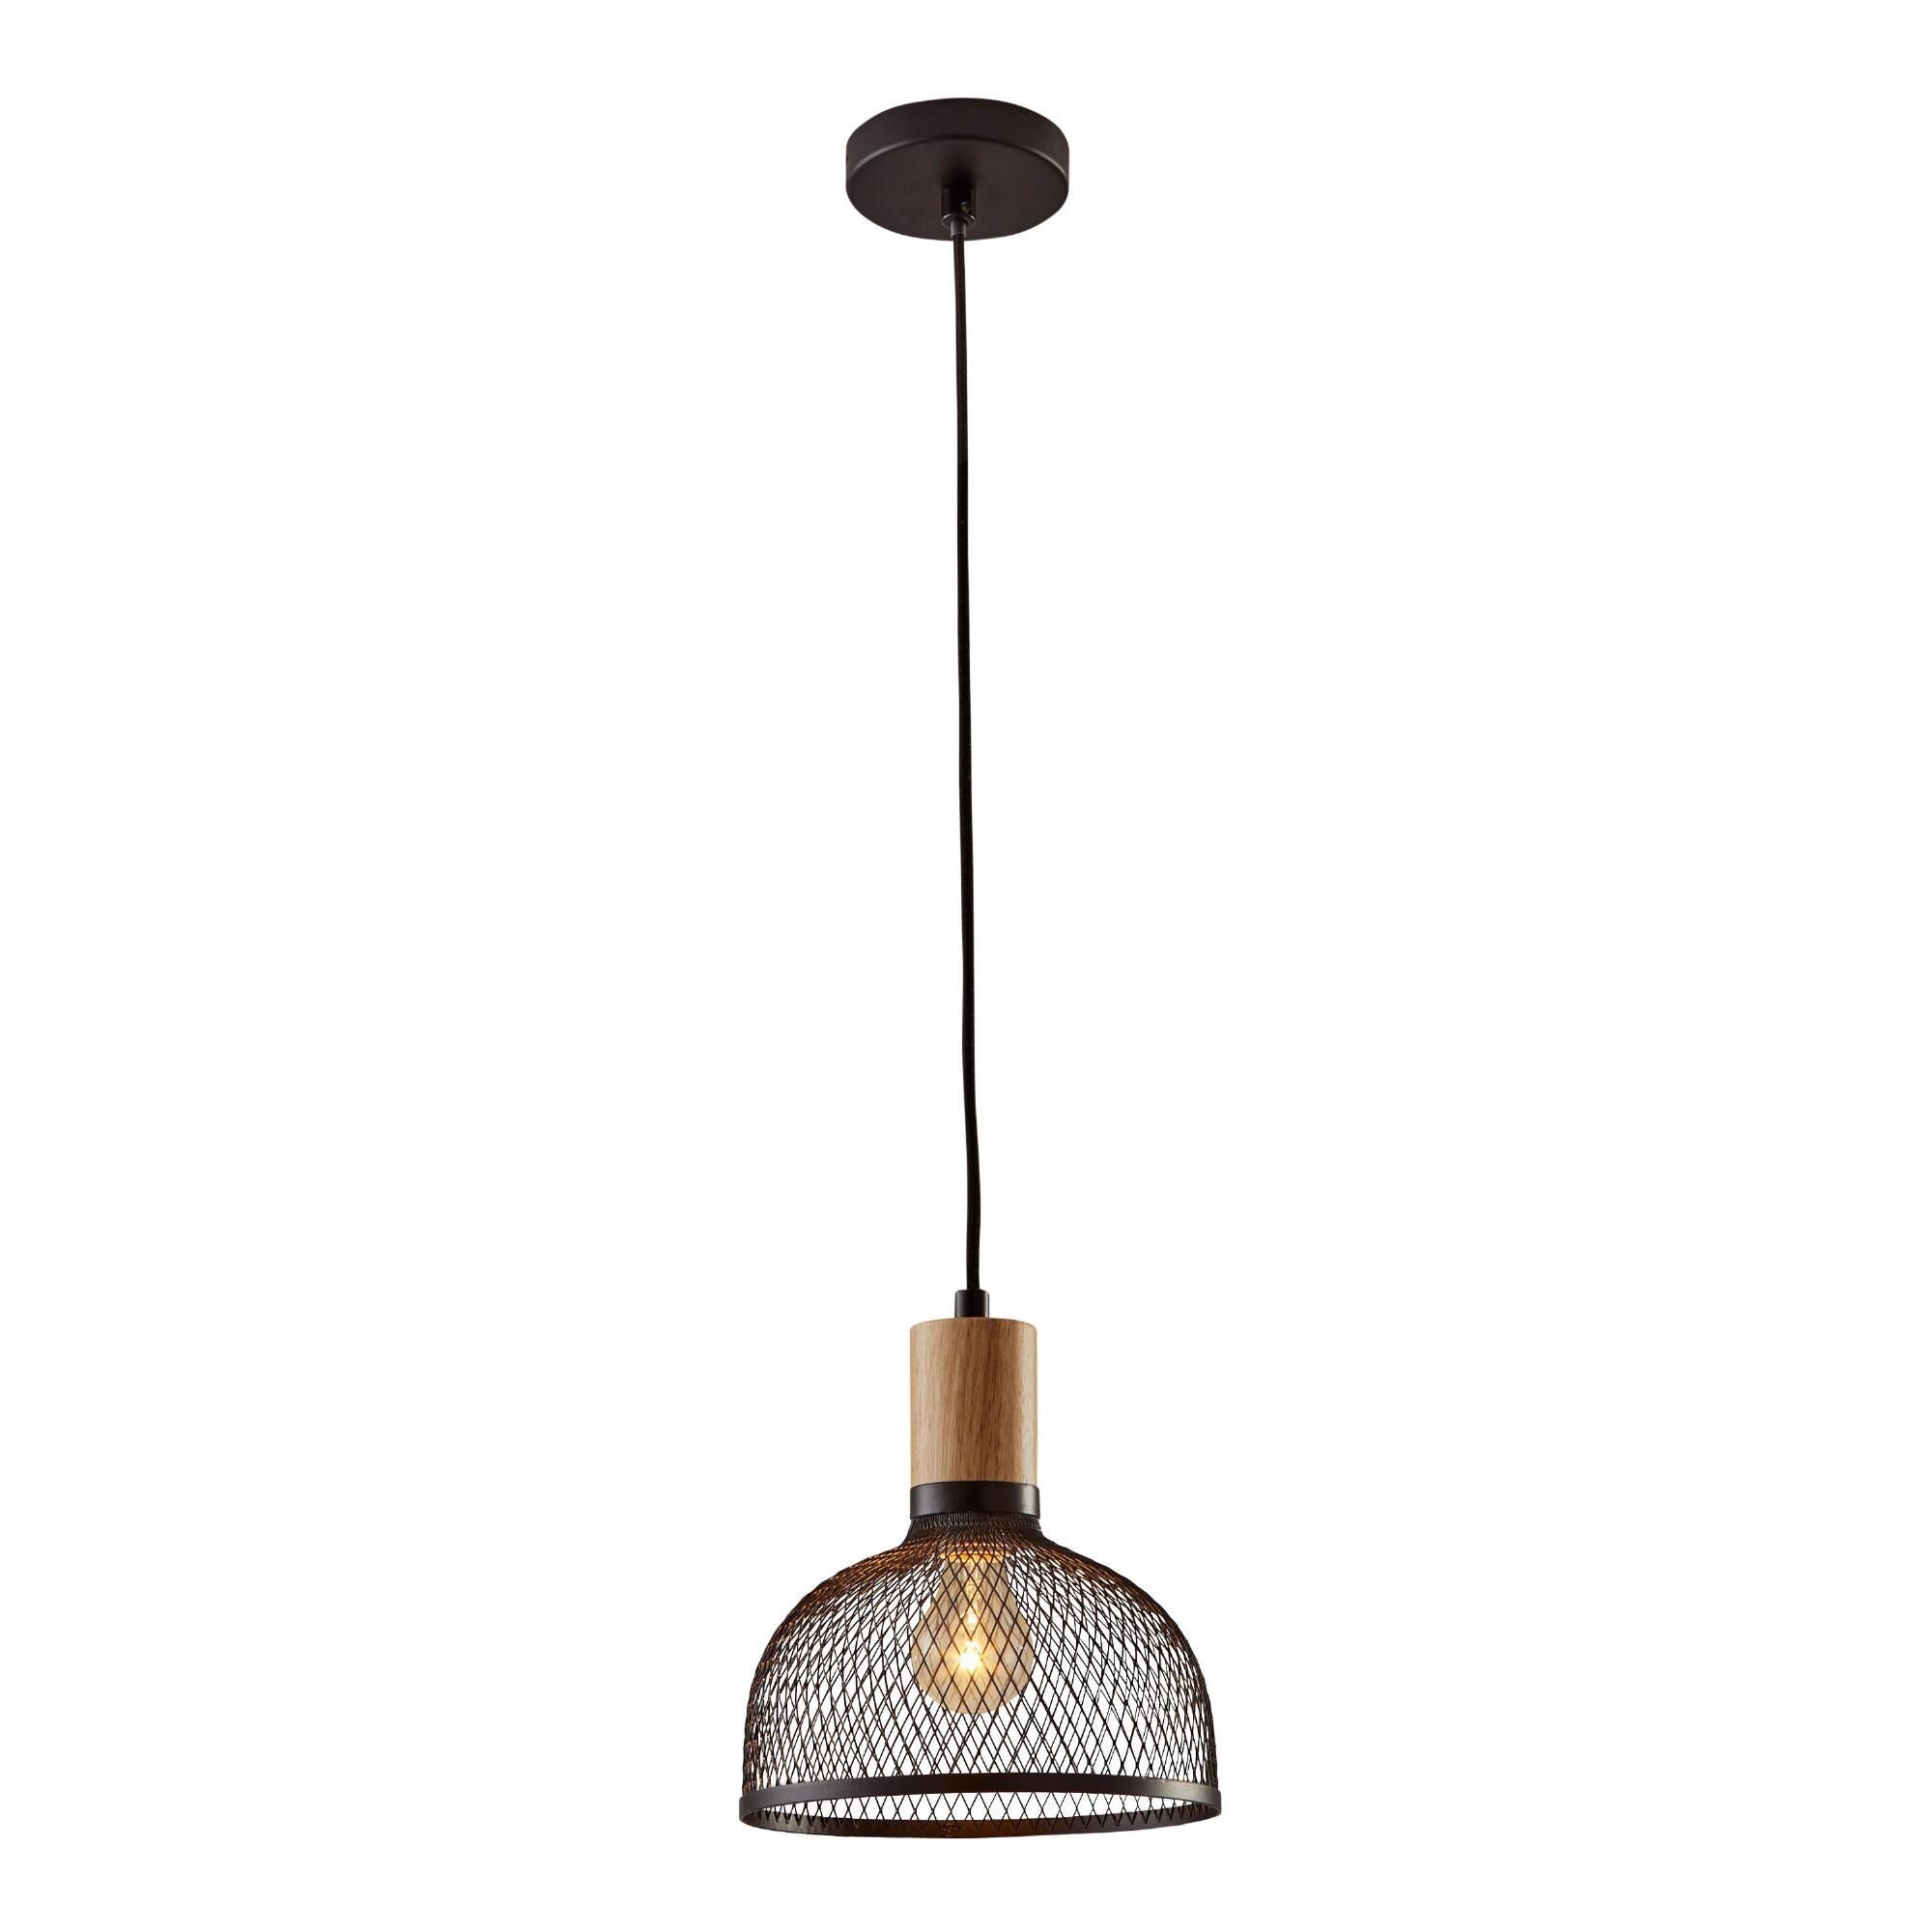 Small Black Mesh And Wood Clint Pendant Lamp $99.99